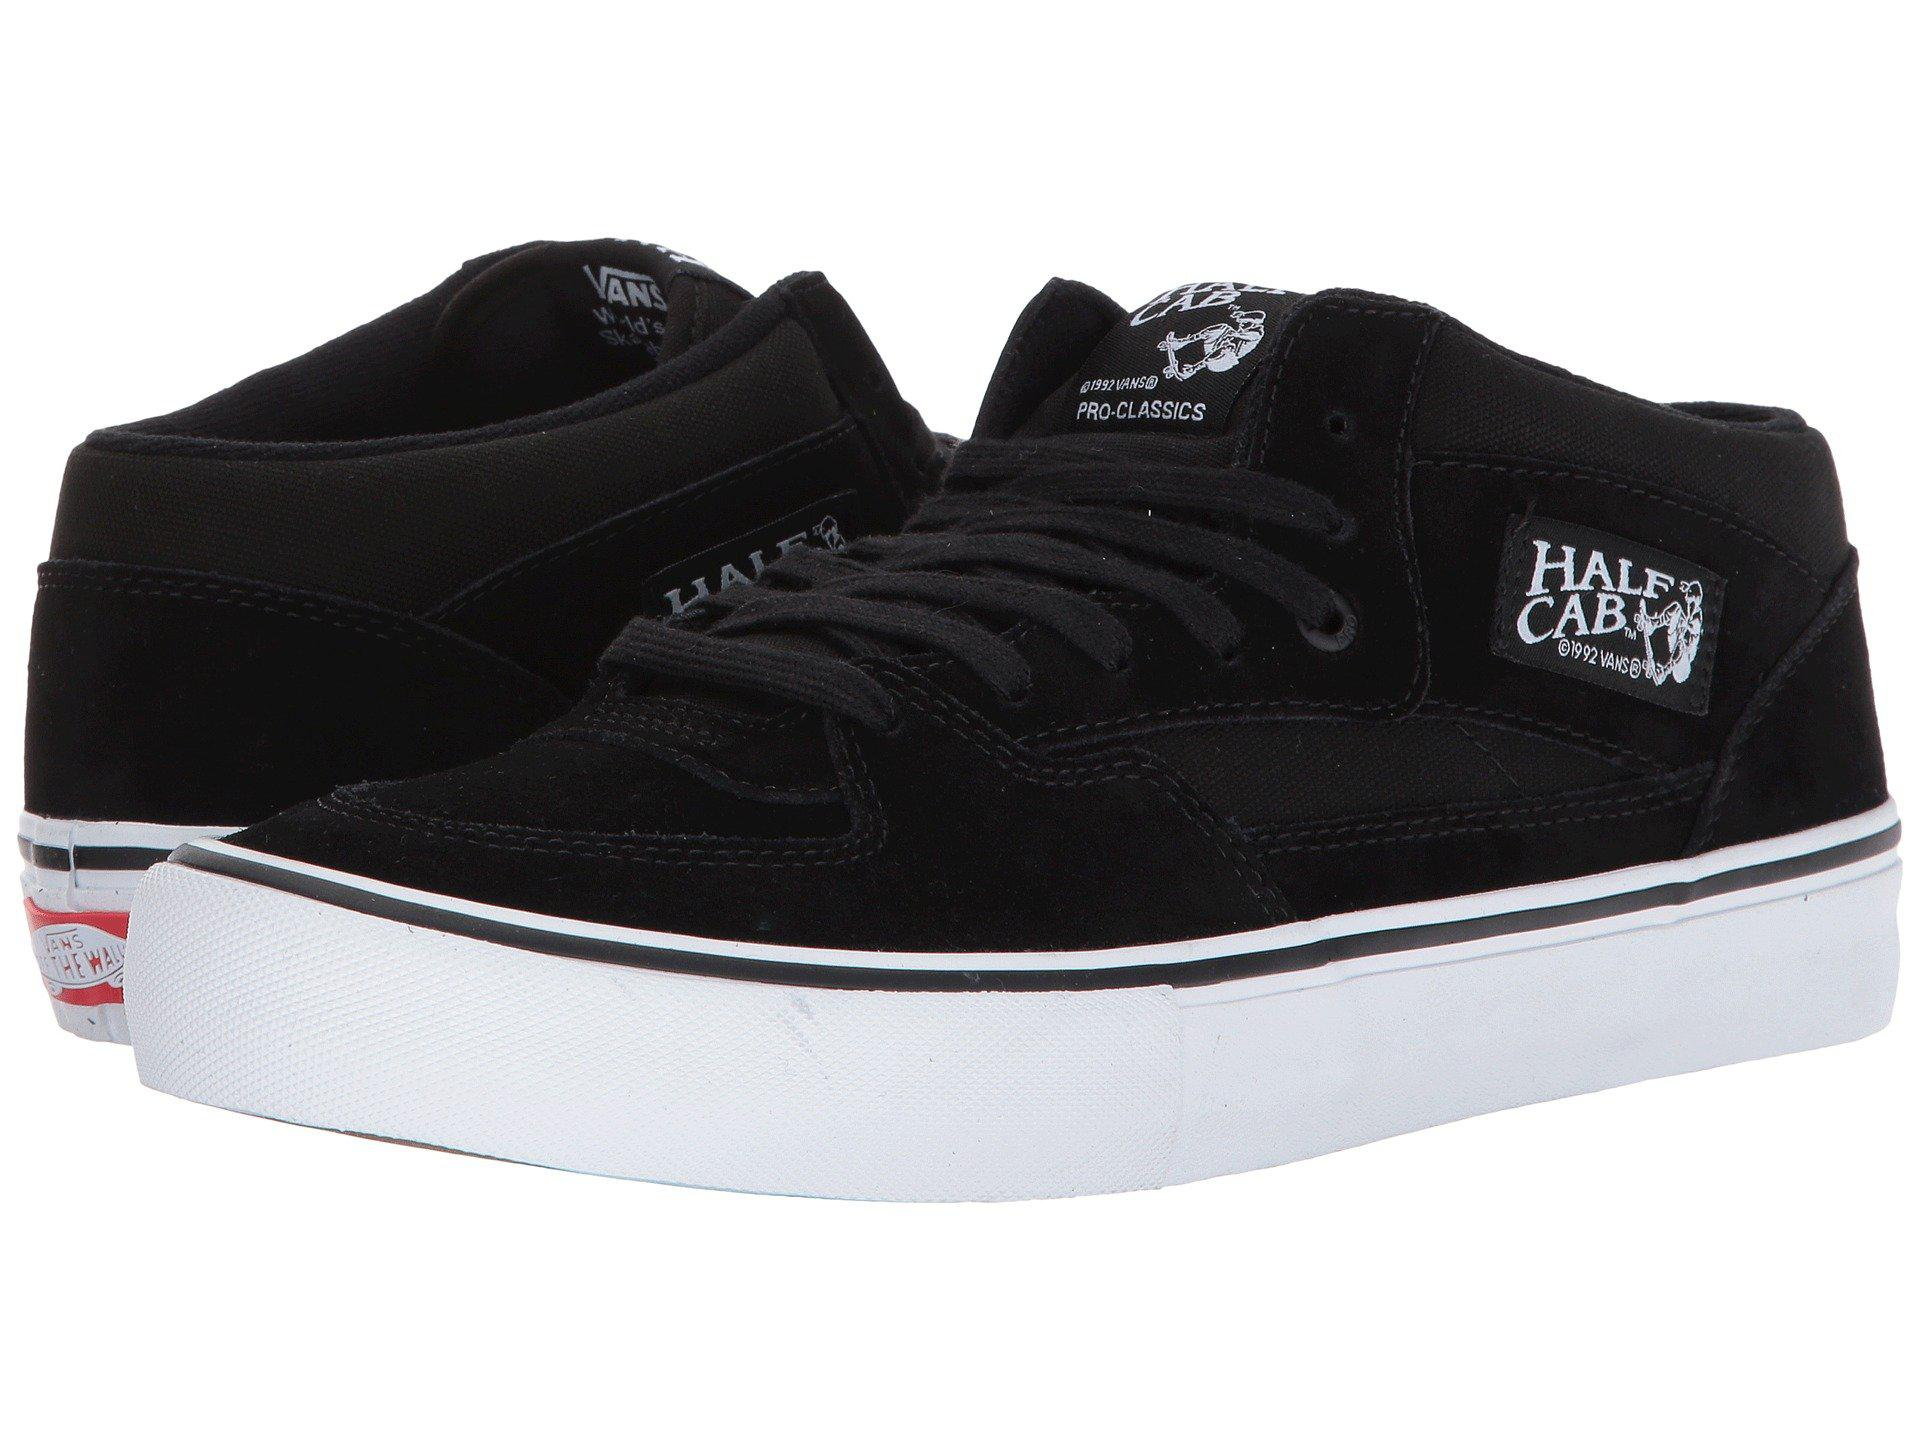 e1d7607005 Lyst - Vans Half Cab(r) Pro (black black white) Men s Skate Shoes in ...